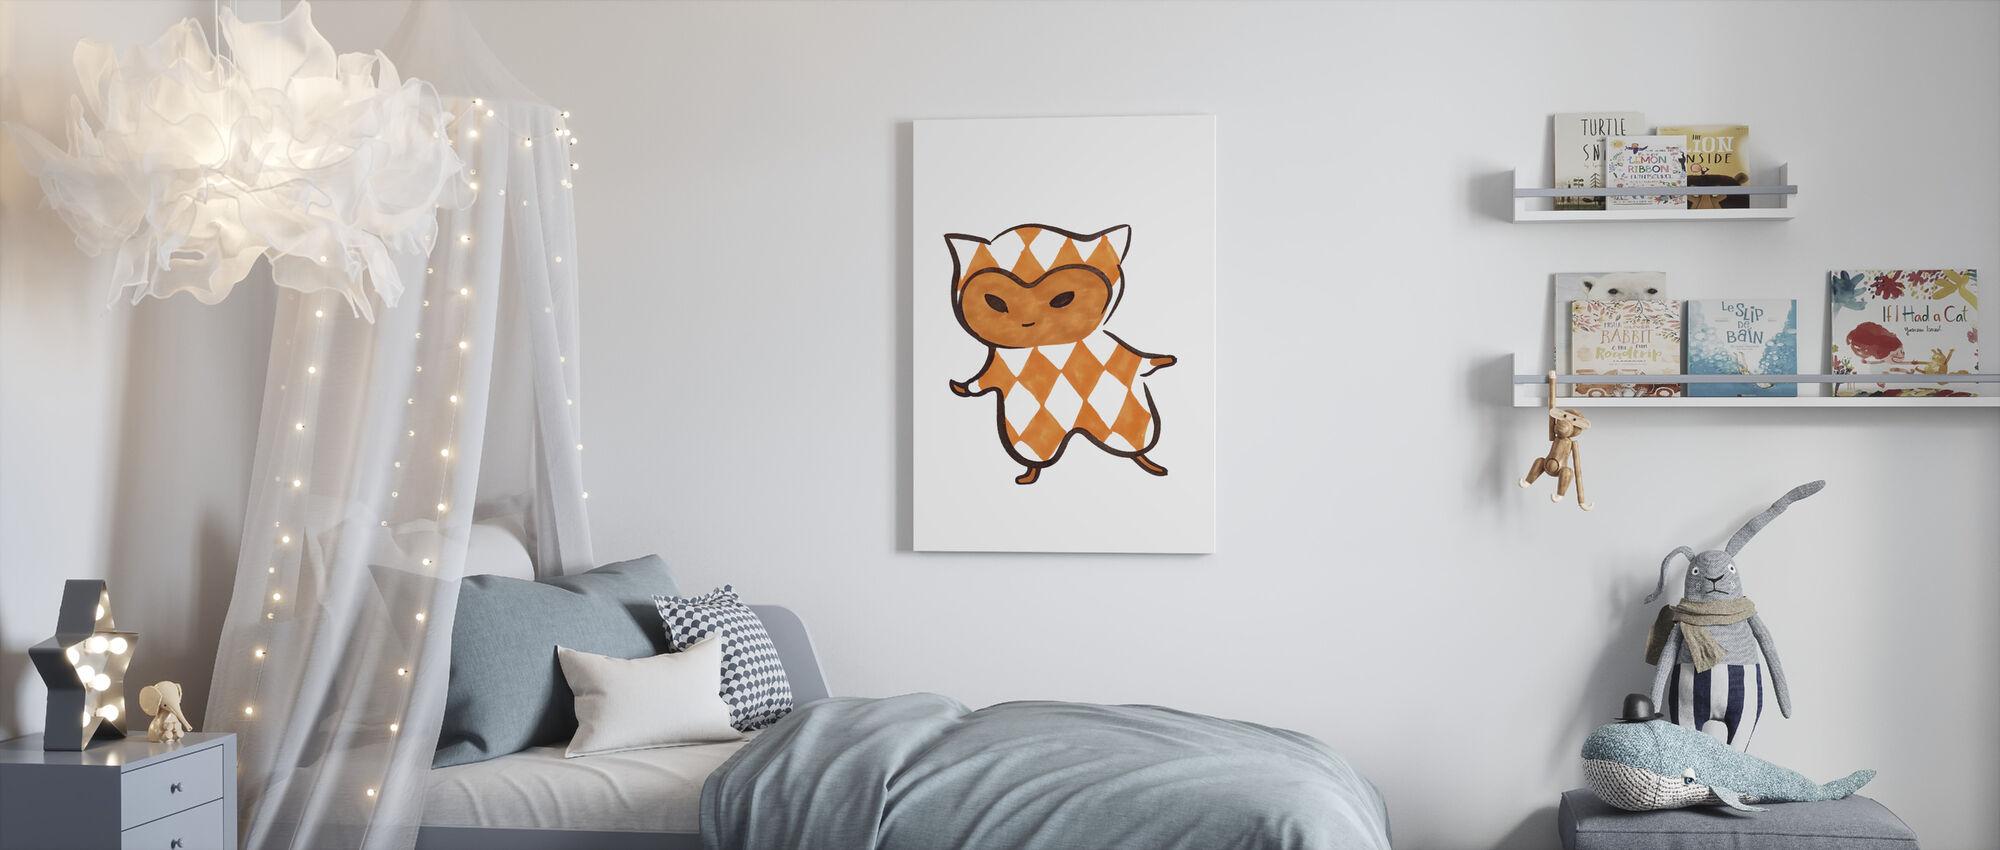 Vierkant - Ruta - Canvas print - Kinderkamer